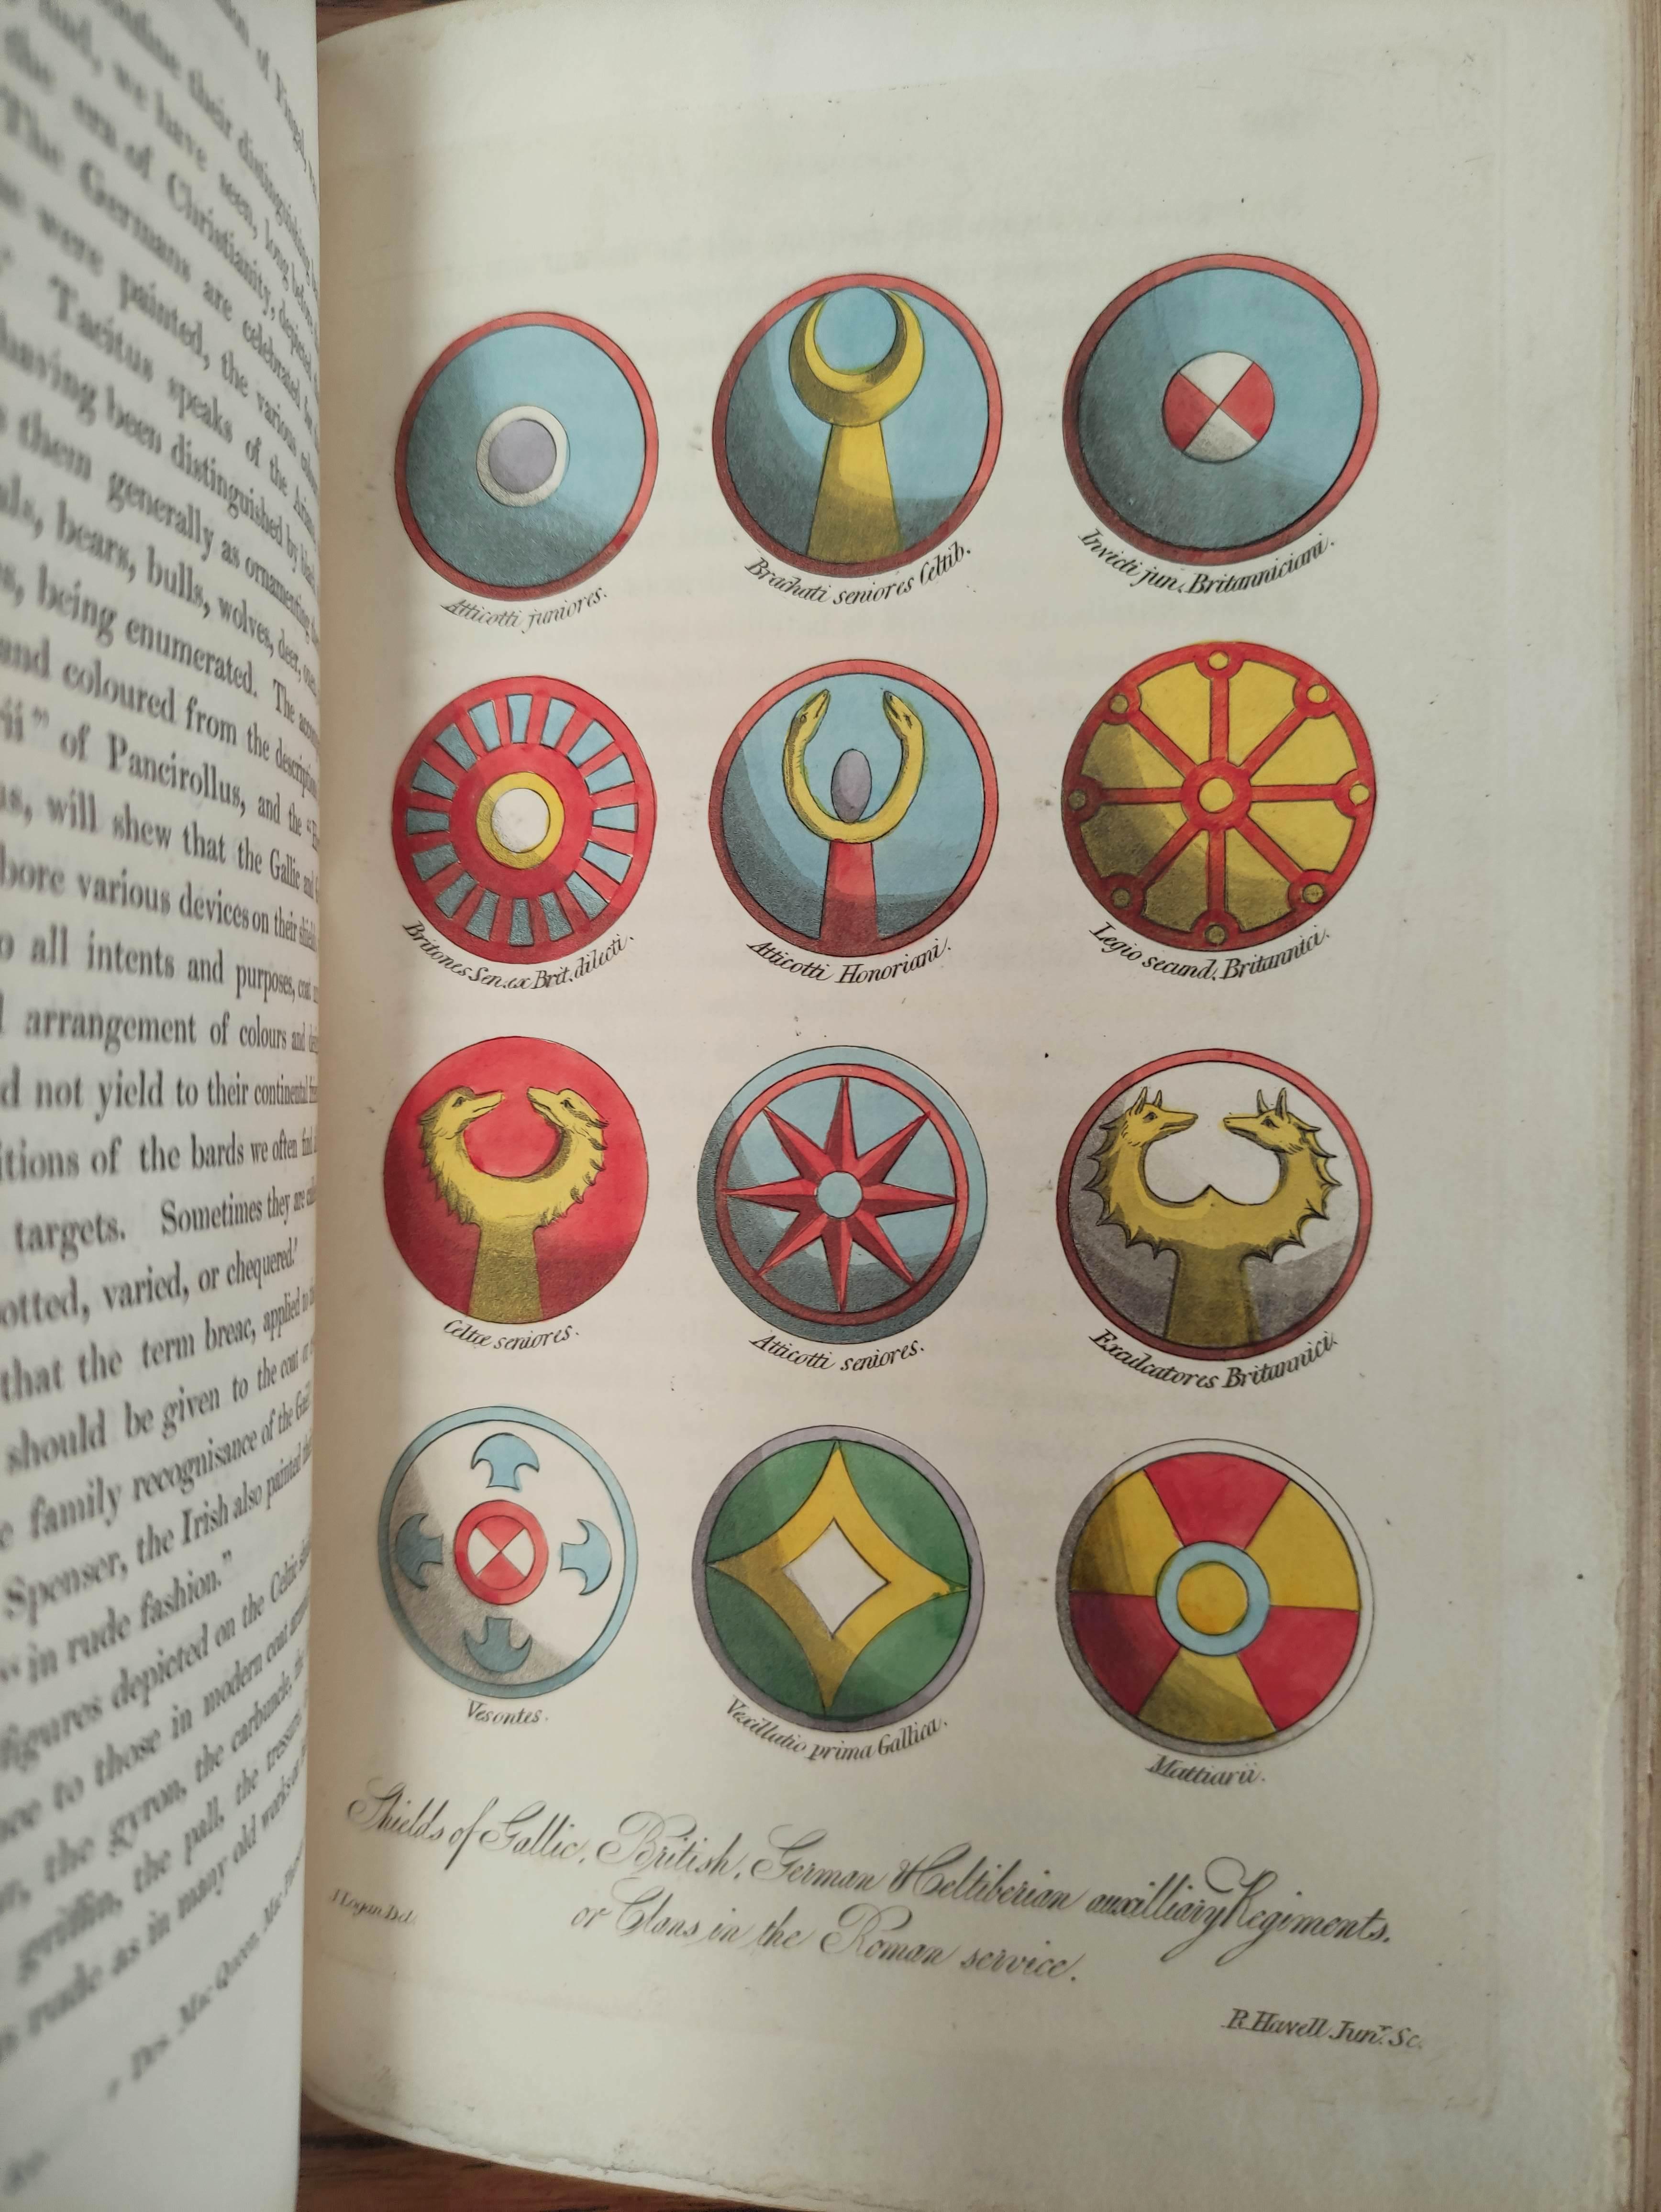 LOGAN JAMES.The Scottish Gael. 2 vols. Col. frontis & text illus. Half green morocco. A nice - Image 6 of 10